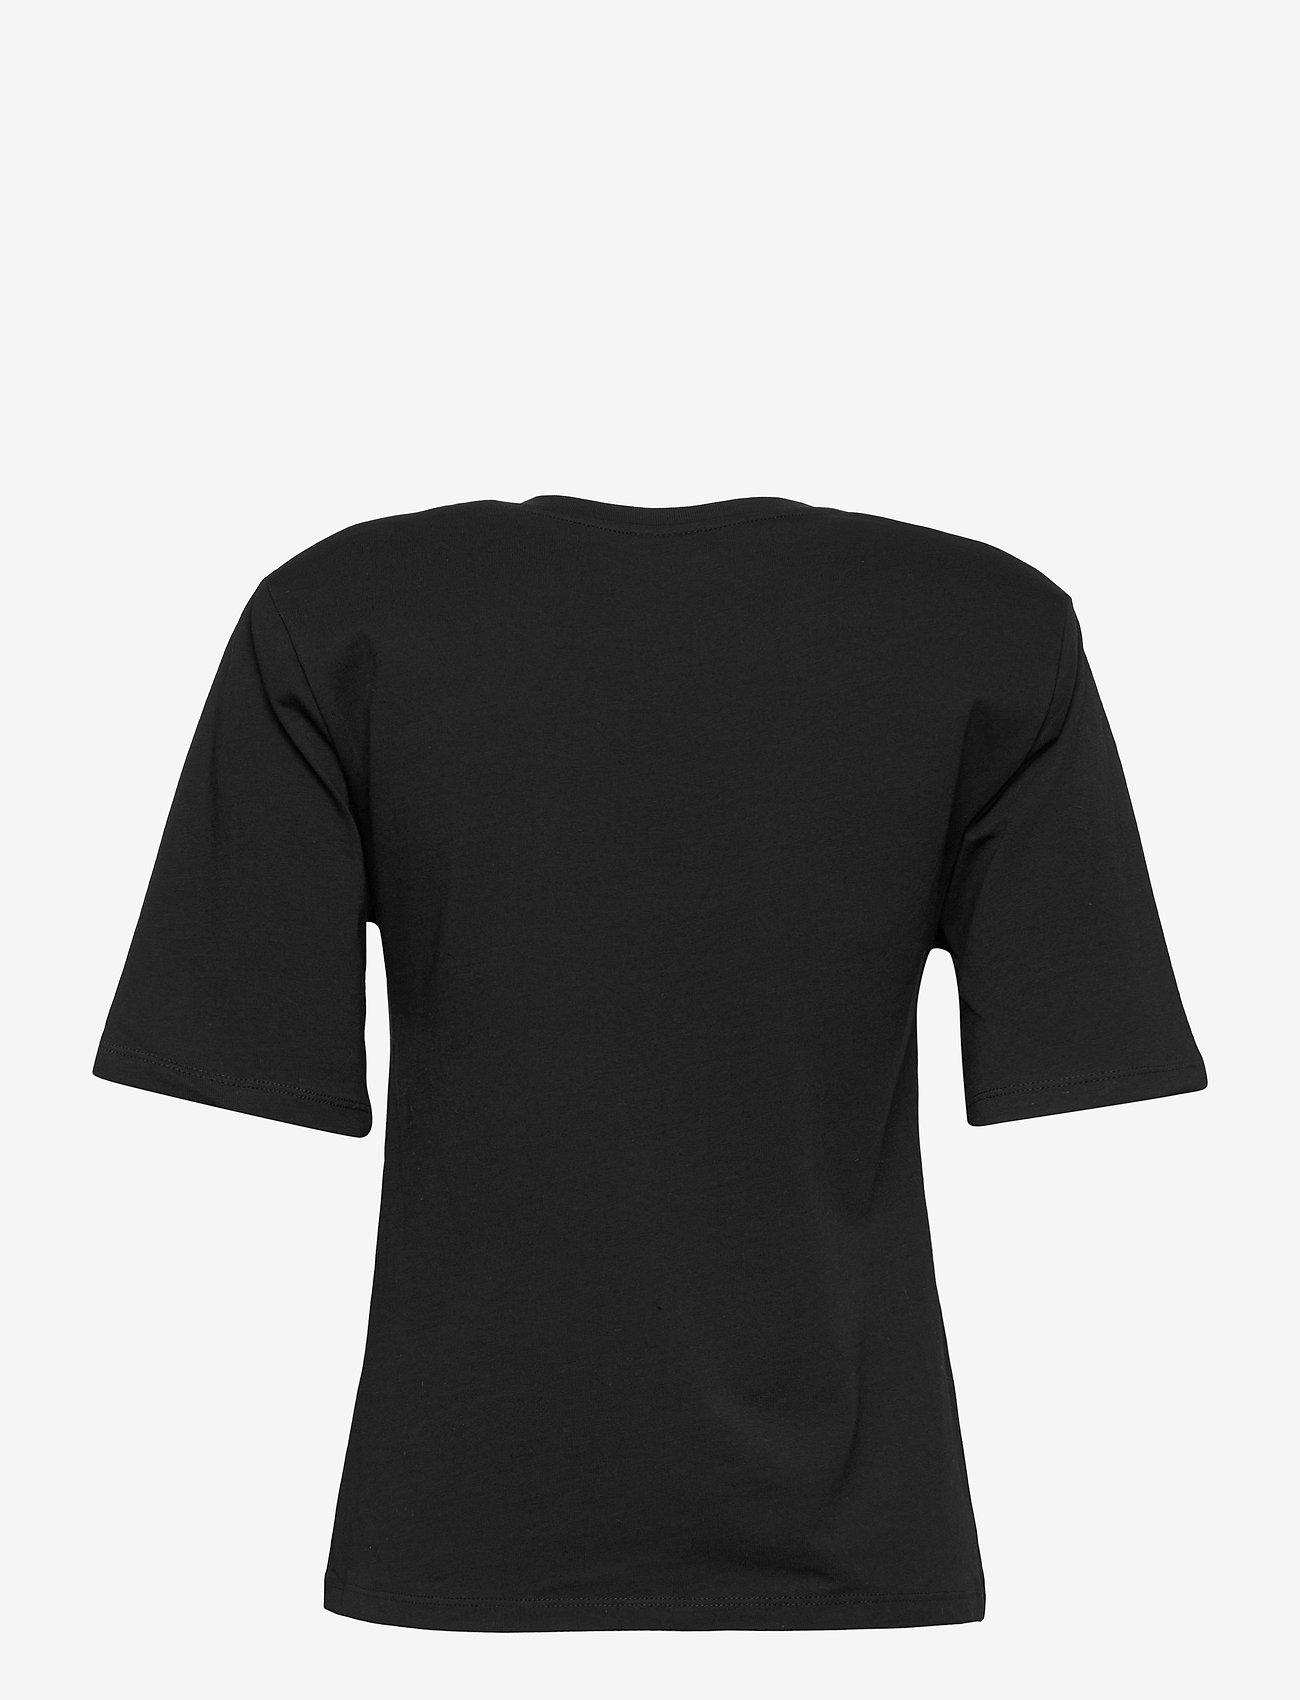 Gina Tricot - Tara tee - t-shirts - black (9000) - 1